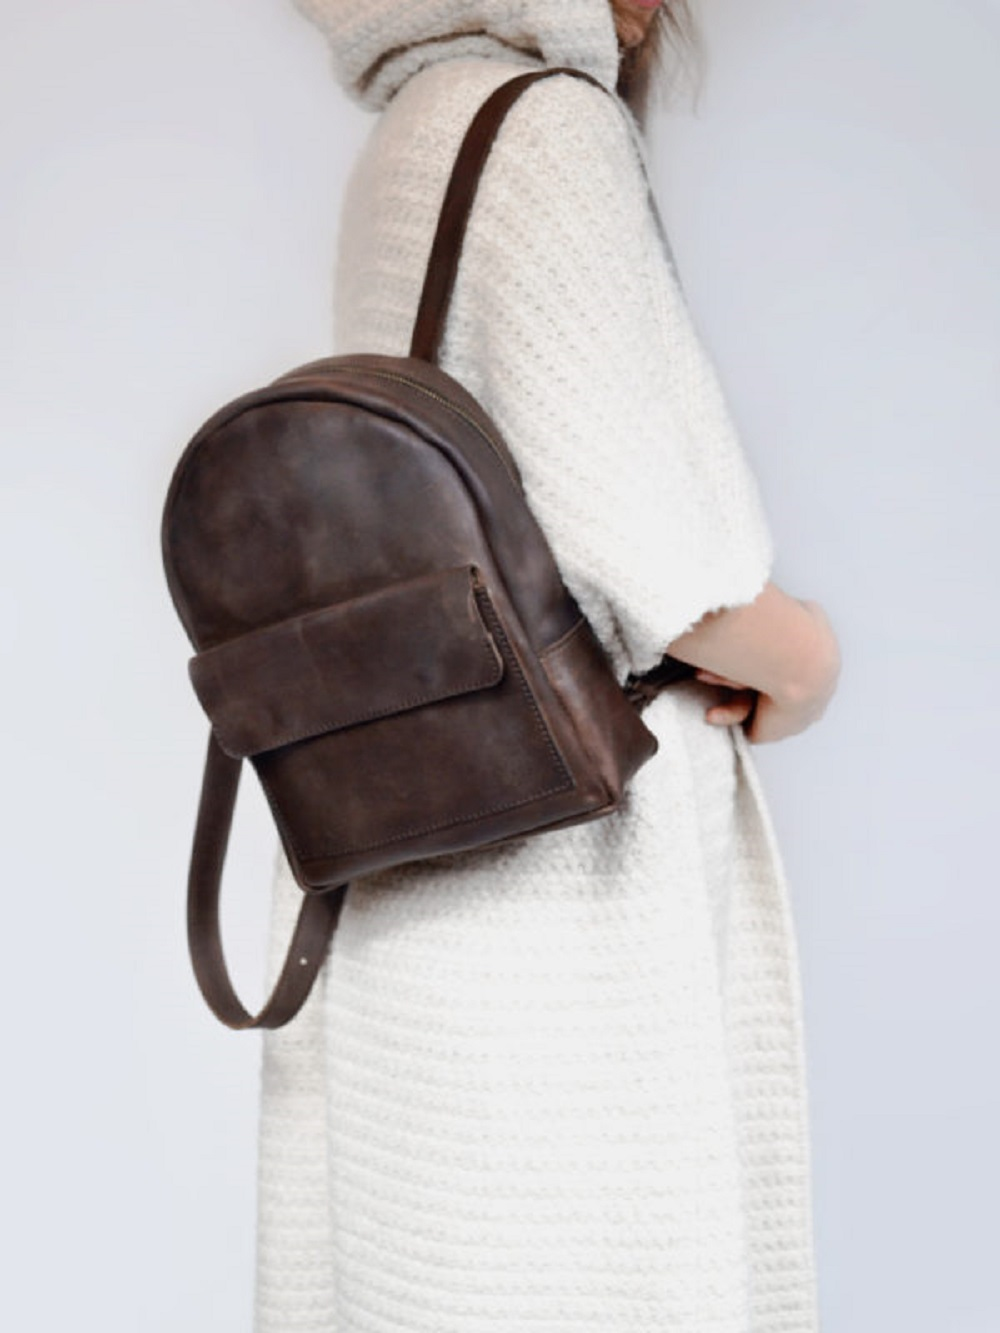 PLECAK P04 VINTAGE BROWN - plecak brązowy retro ze skóry naturalnej - plecak mały z kieszonką - Lezerton